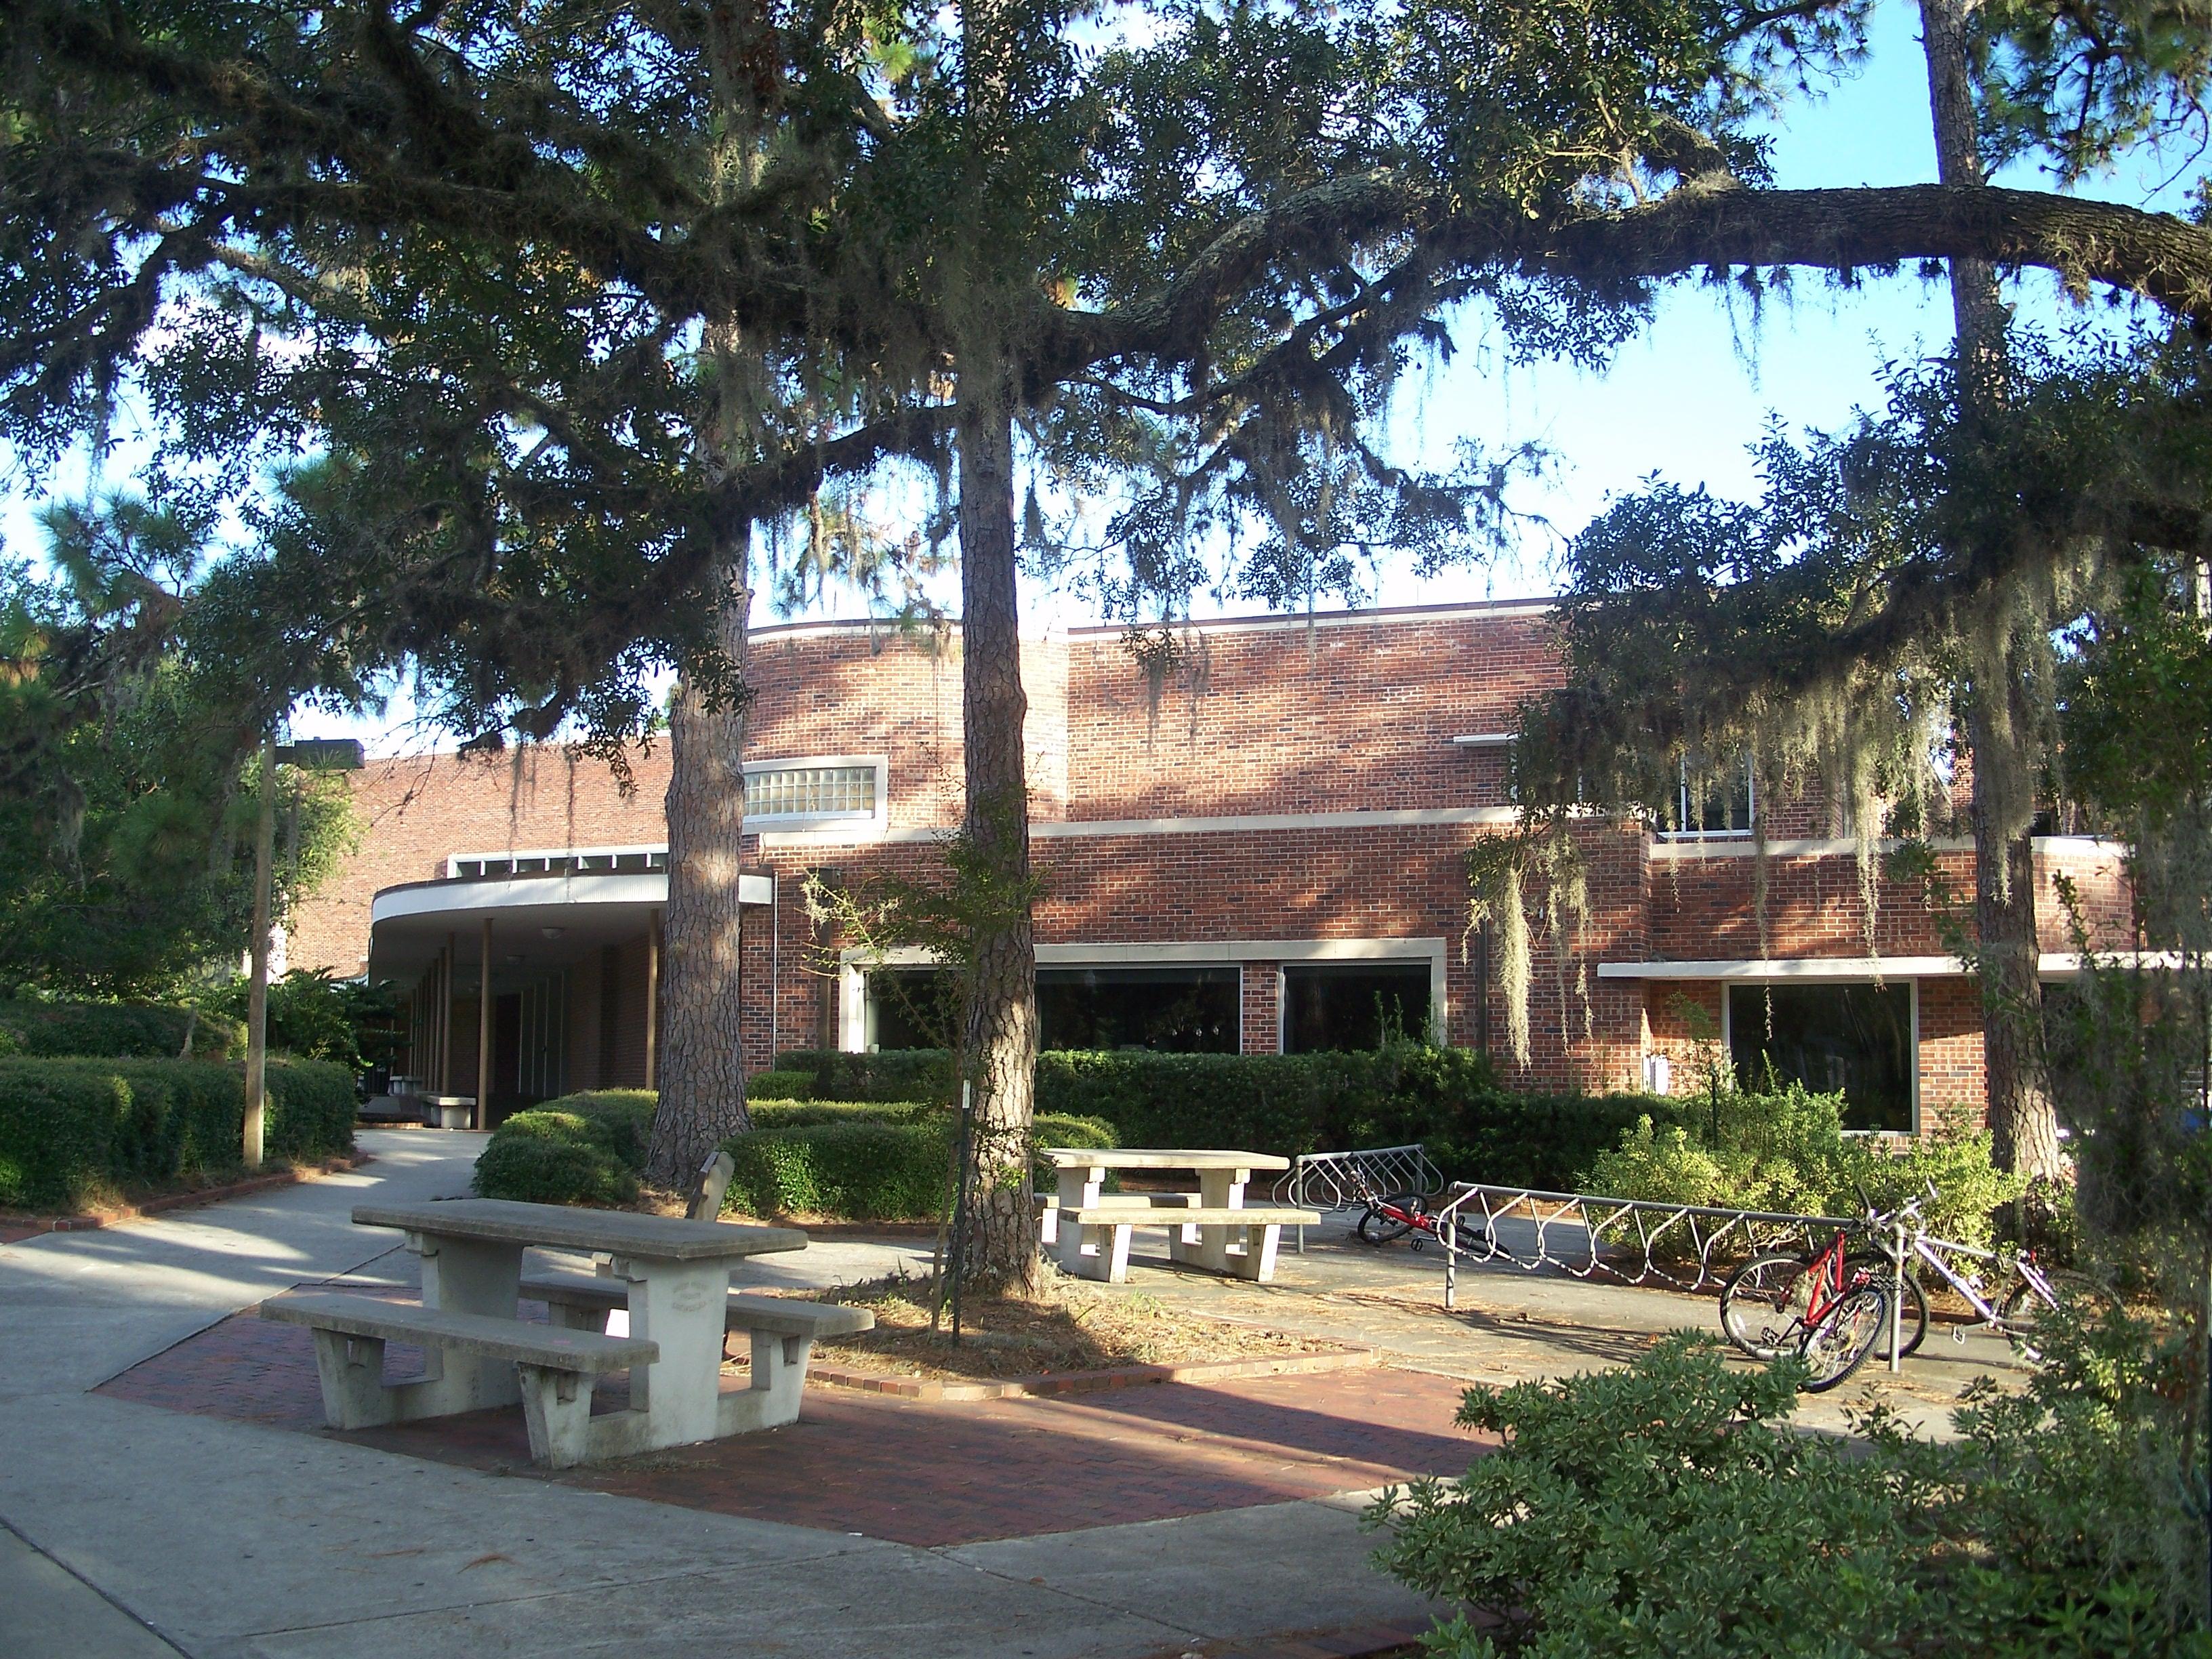 The hub gainesville florida wikipedia